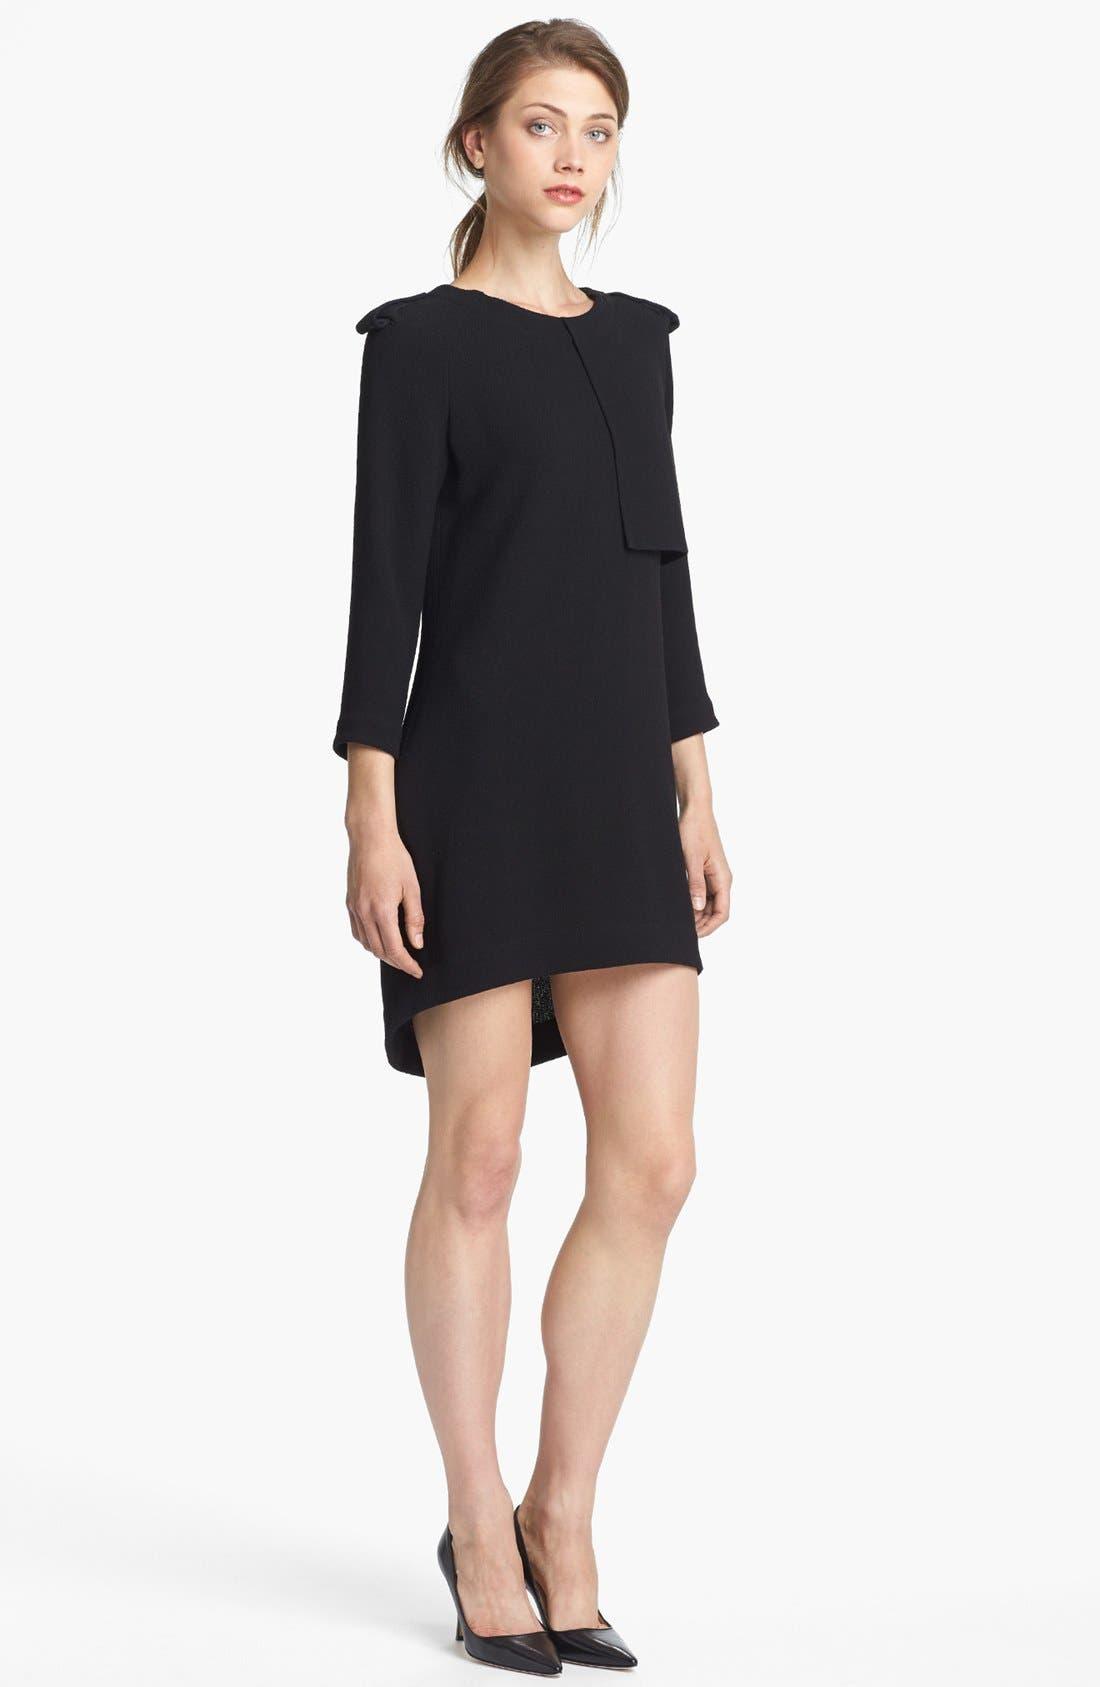 Alternate Image 1 Selected - A.L.C. 'Svieta' Wool High/Low Dress